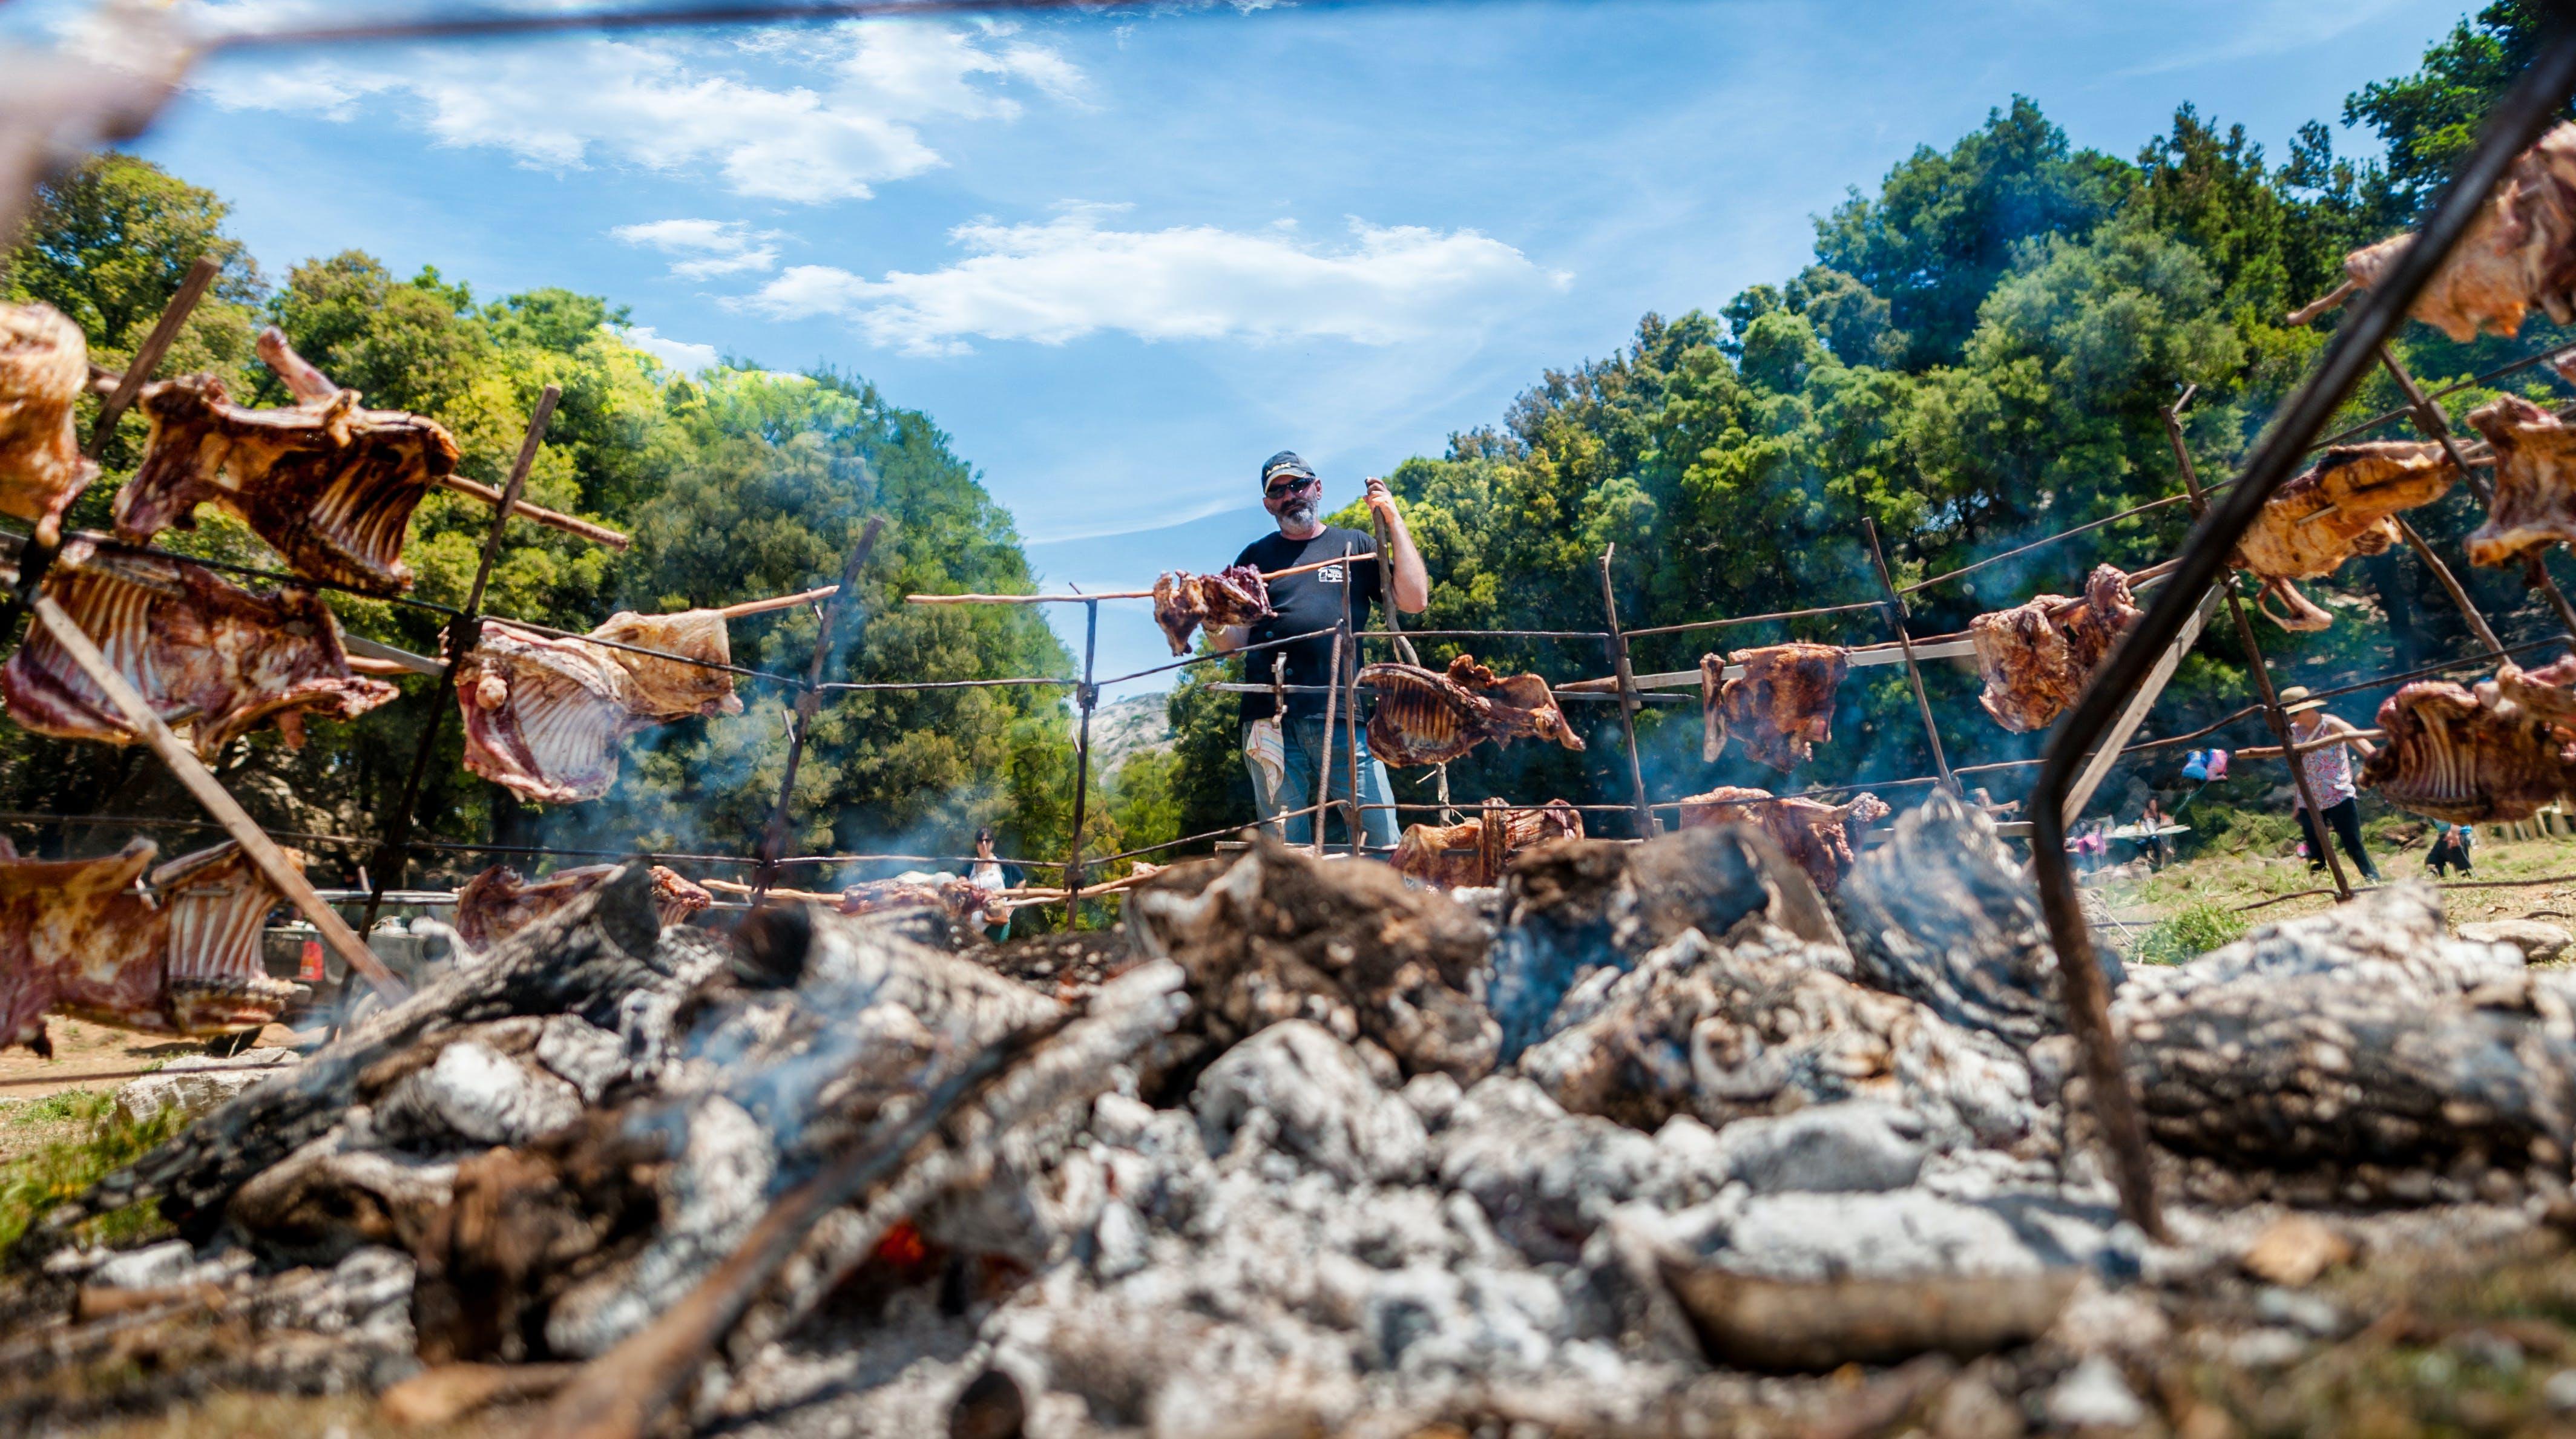 Free stock photo of farmer, lifestyle, barbecue, lamb